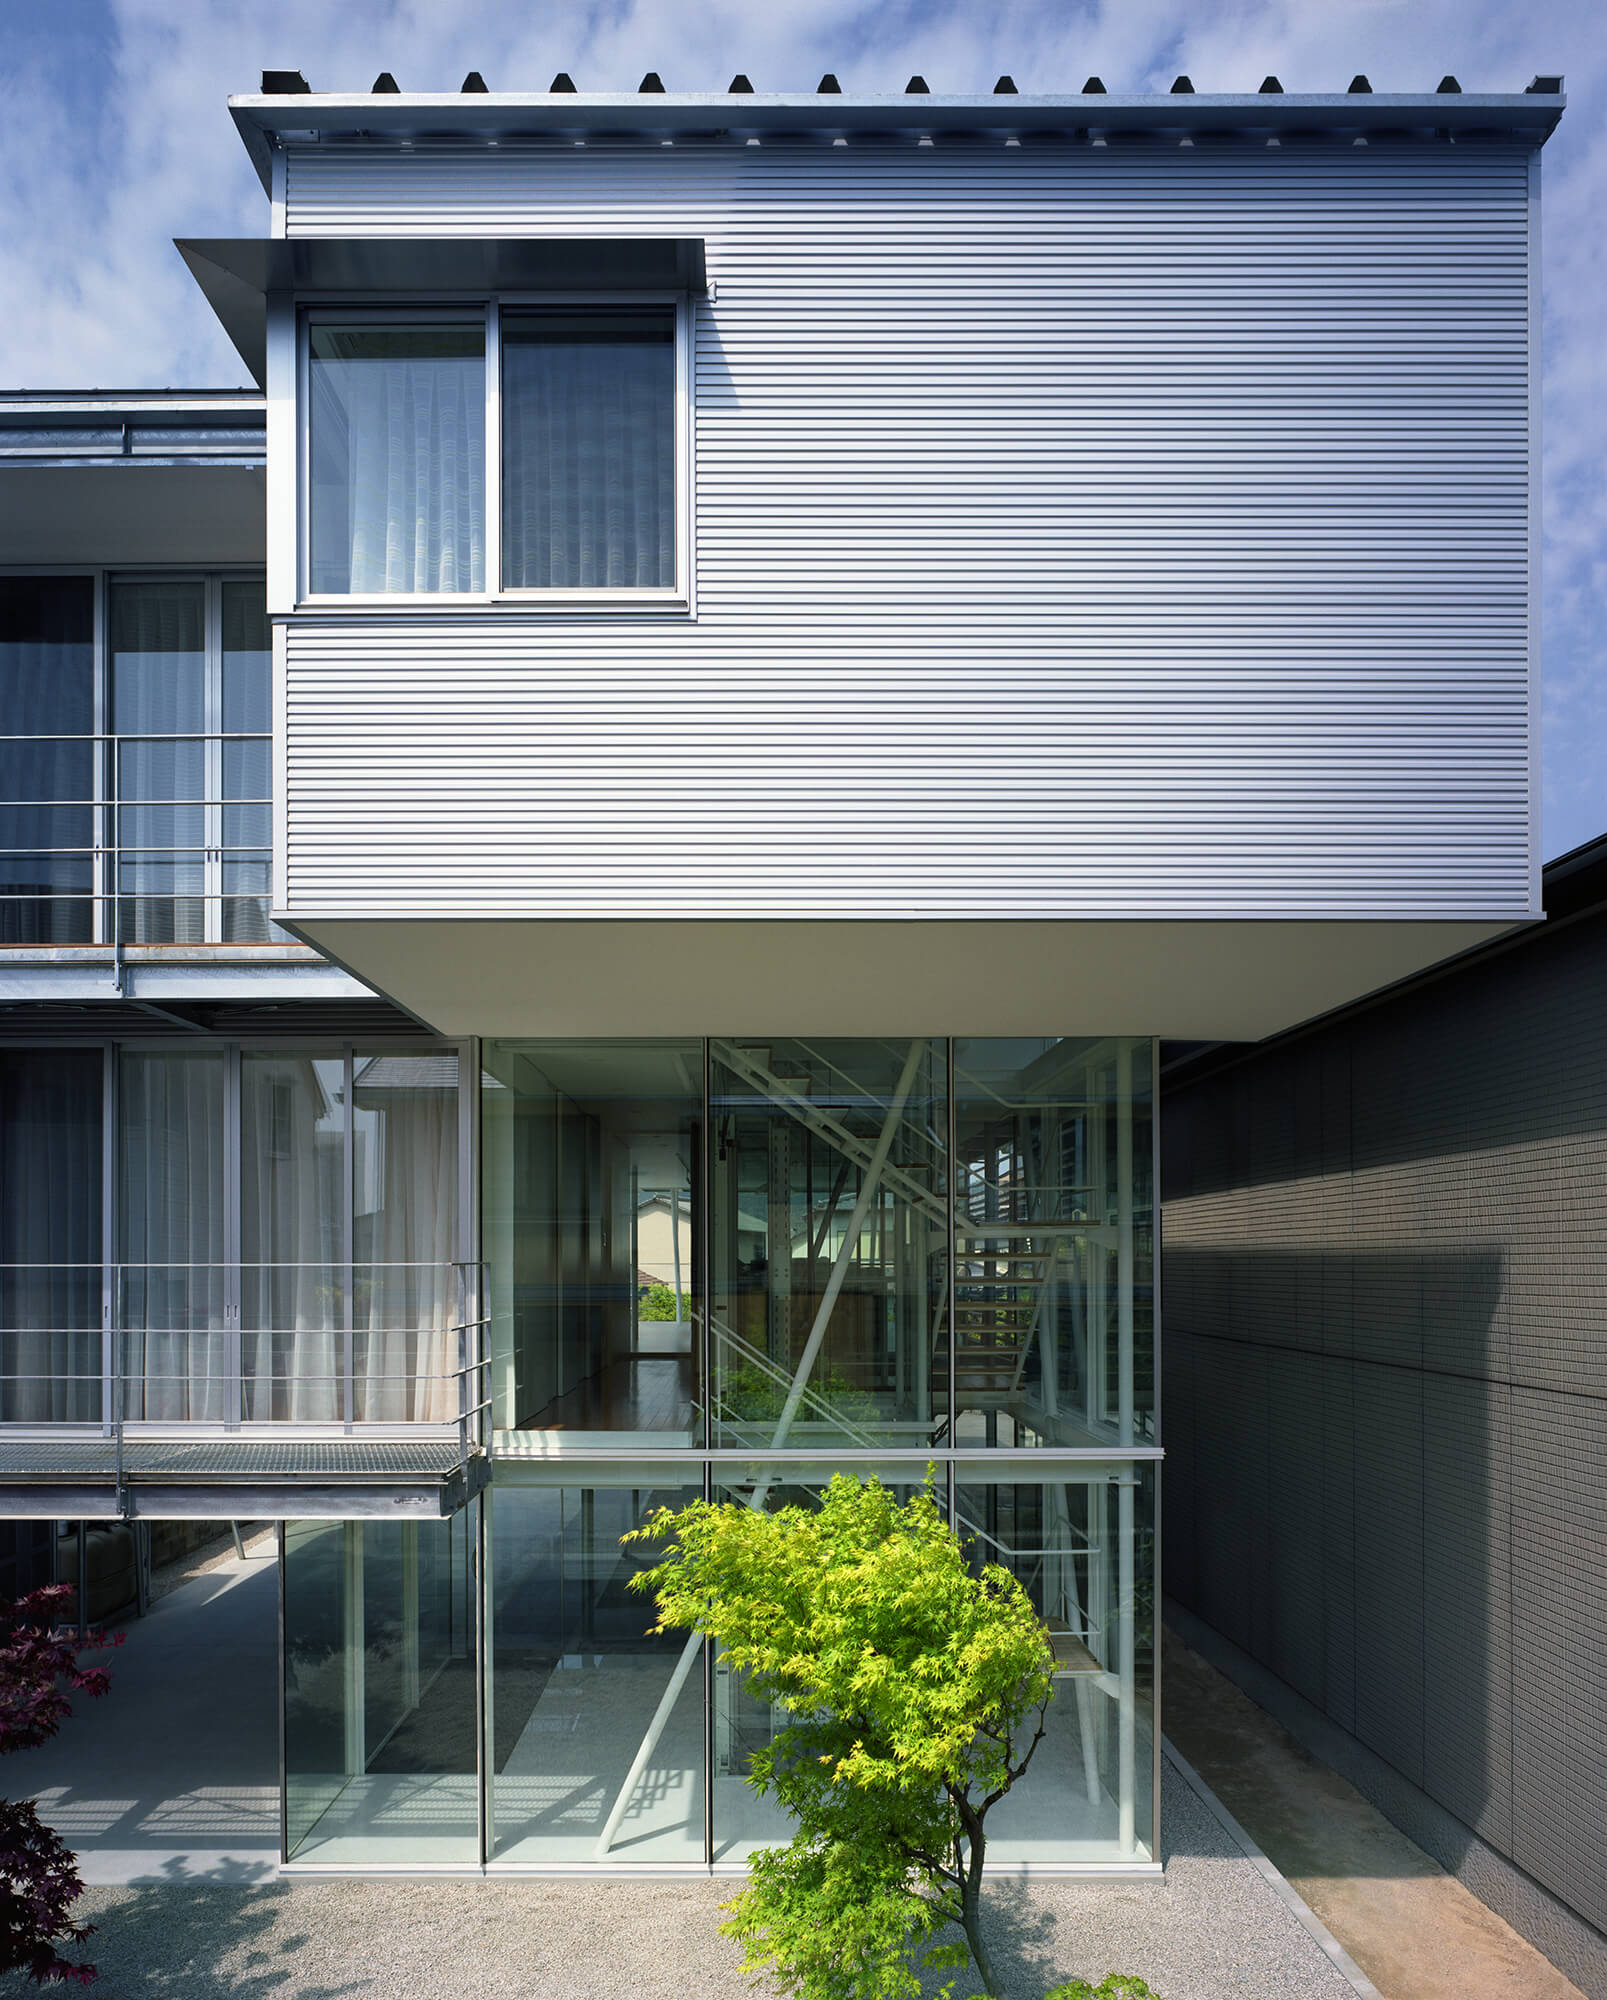 『筒井の家』-福岡県大野城市-建築写真・竣工写真・インテリア写真3